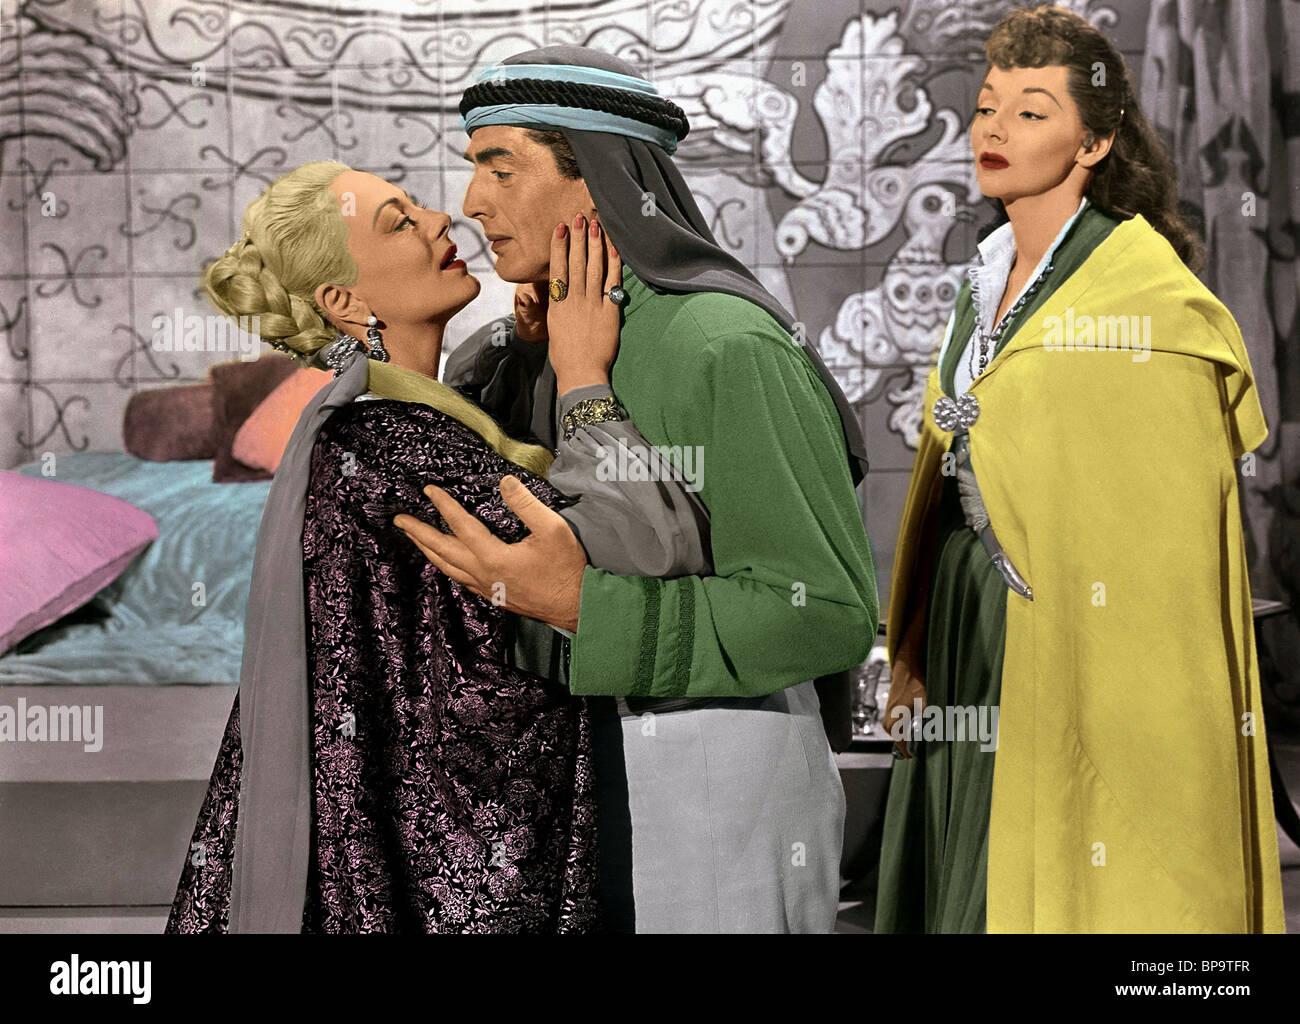 VIRGINIA FIELD, VICTOR MATURE, MARI BLANCHARD, THE VEILS OF BAGDAD, 1953 Stock Photo